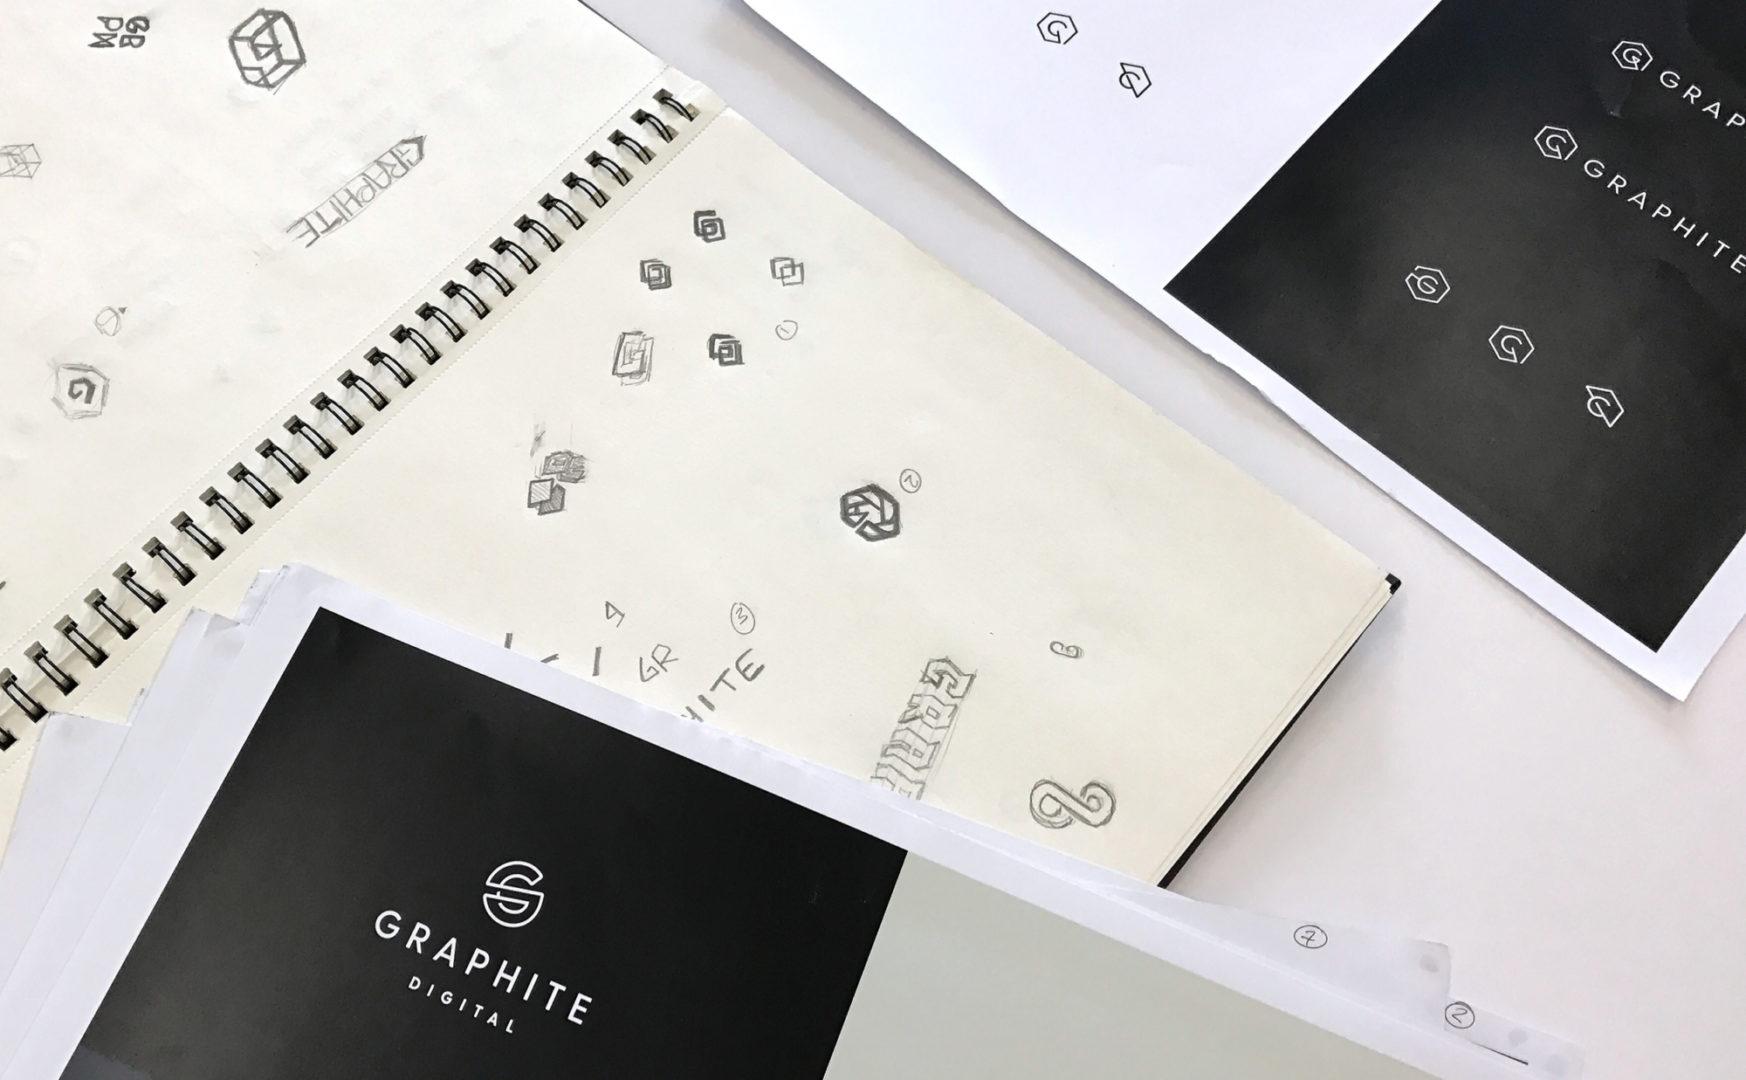 joshyouare-graphite-sketches.jpg